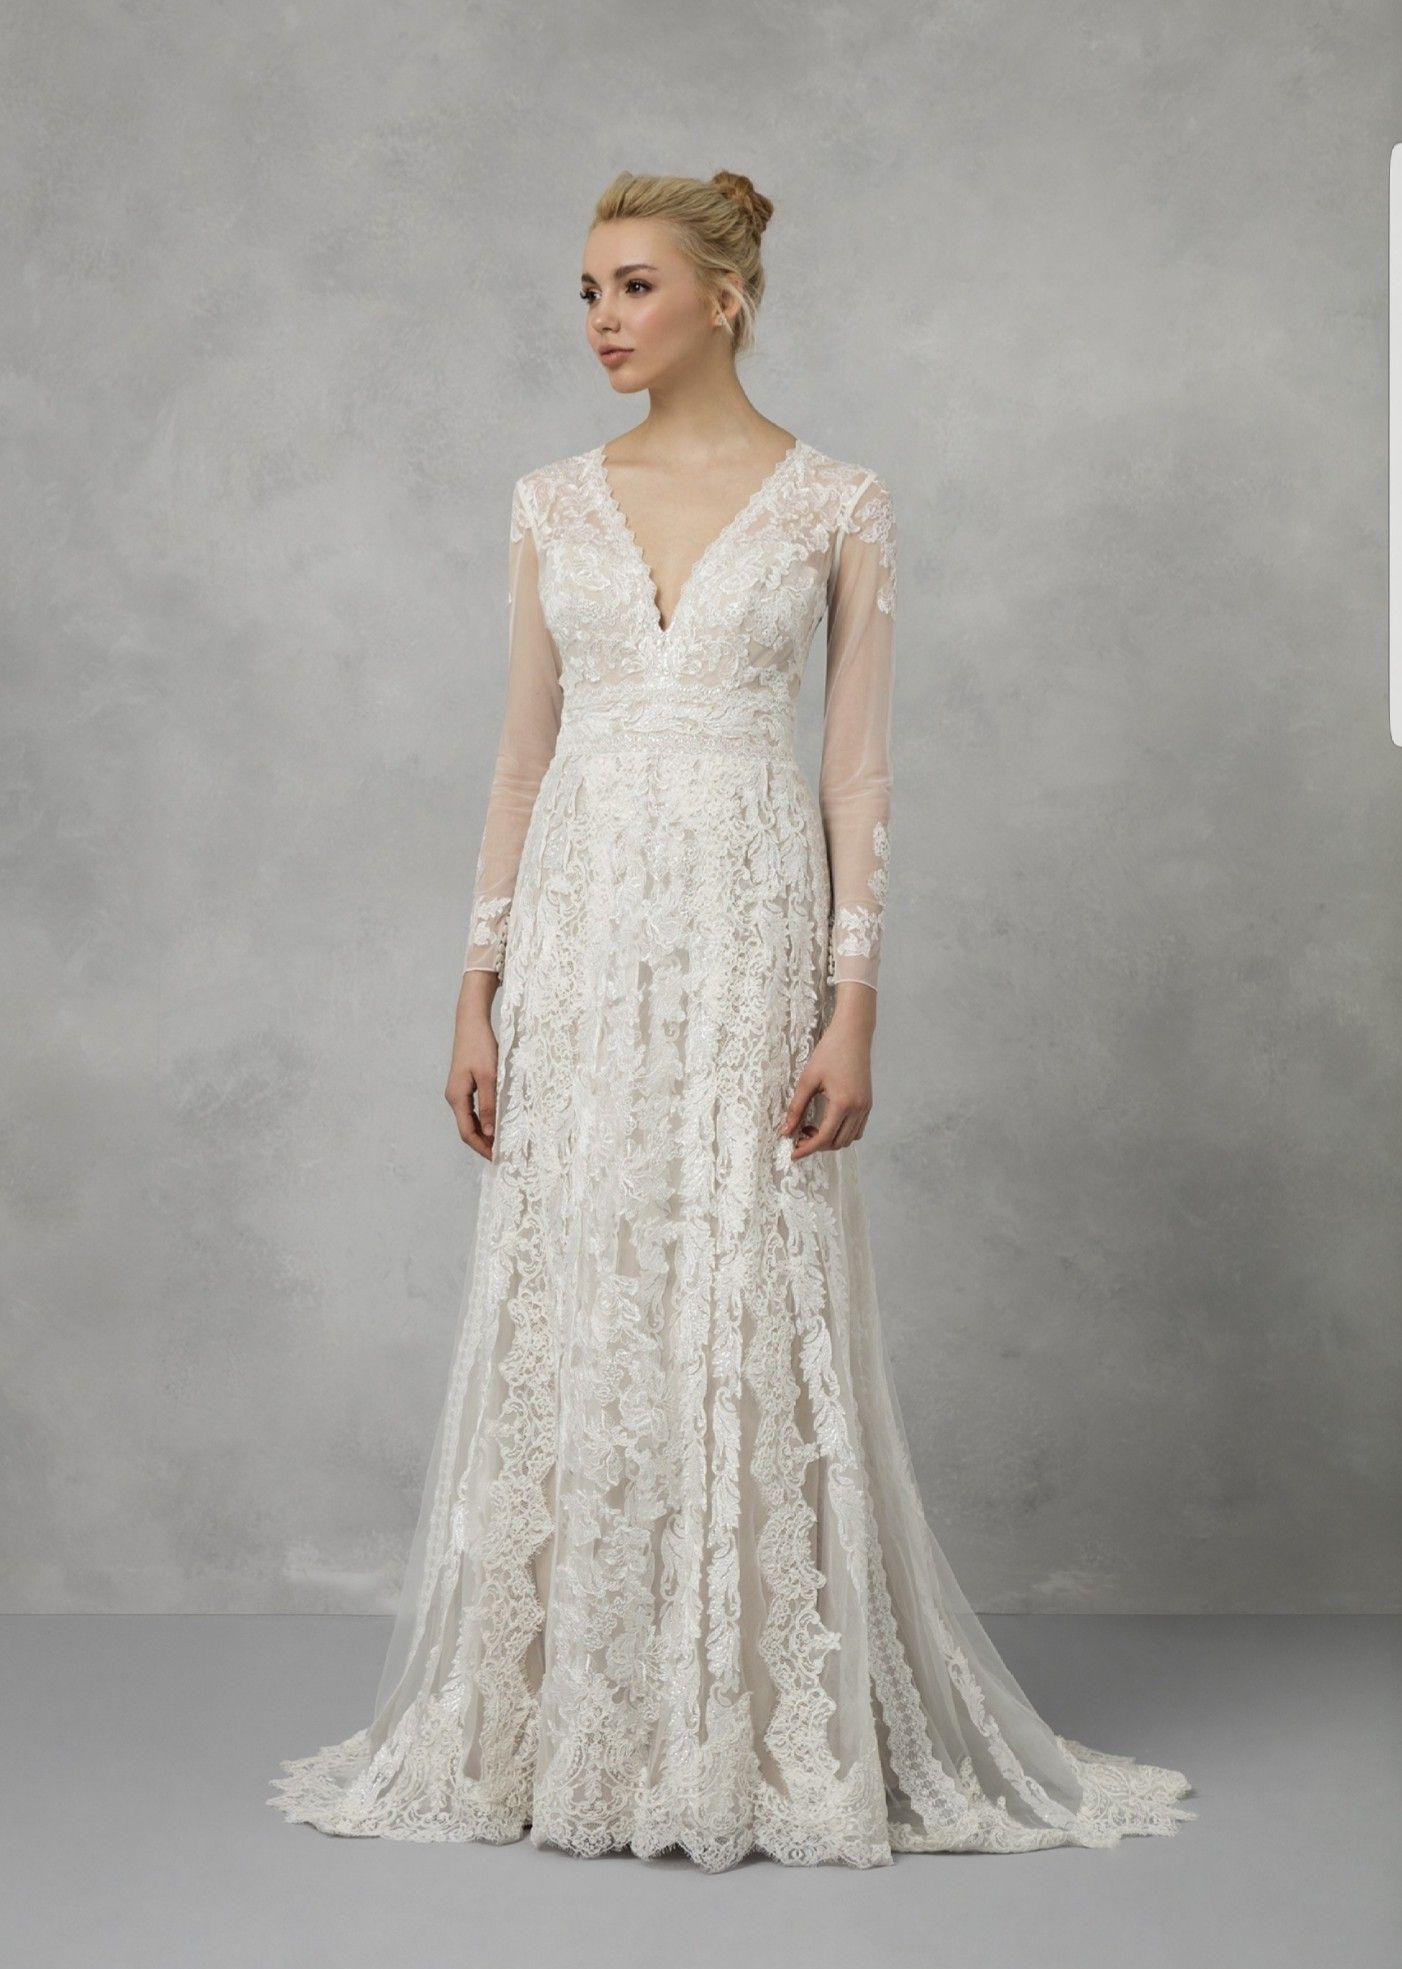 Melissa Sweet Linear Lace Wedding Dress New Wedding Dress On Sale 42 Off Stillwhite New Zeal Wedding Dress Styles Wedding Dresses Lace Sweet Wedding Dresses